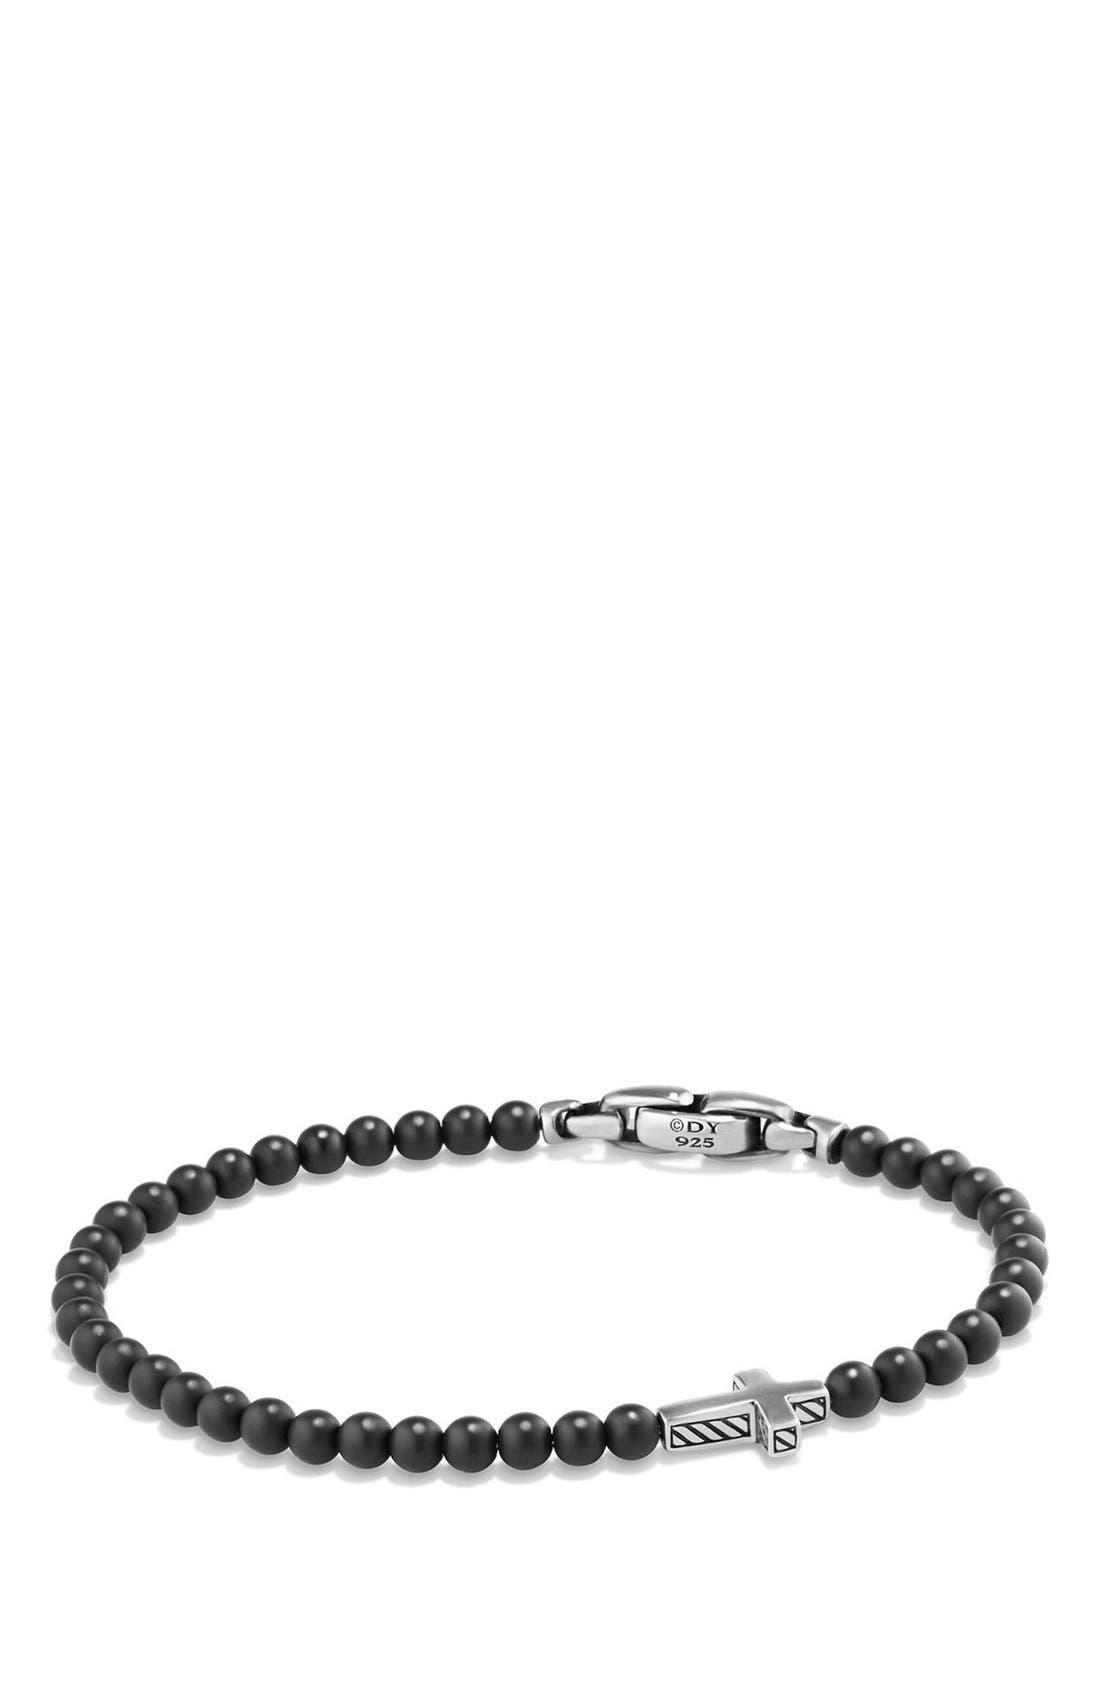 'Spiritual Beads' Cross Bead Bracelet with Semiprecious Stones,                         Main,                         color, SILVER/ BLACK ONYX